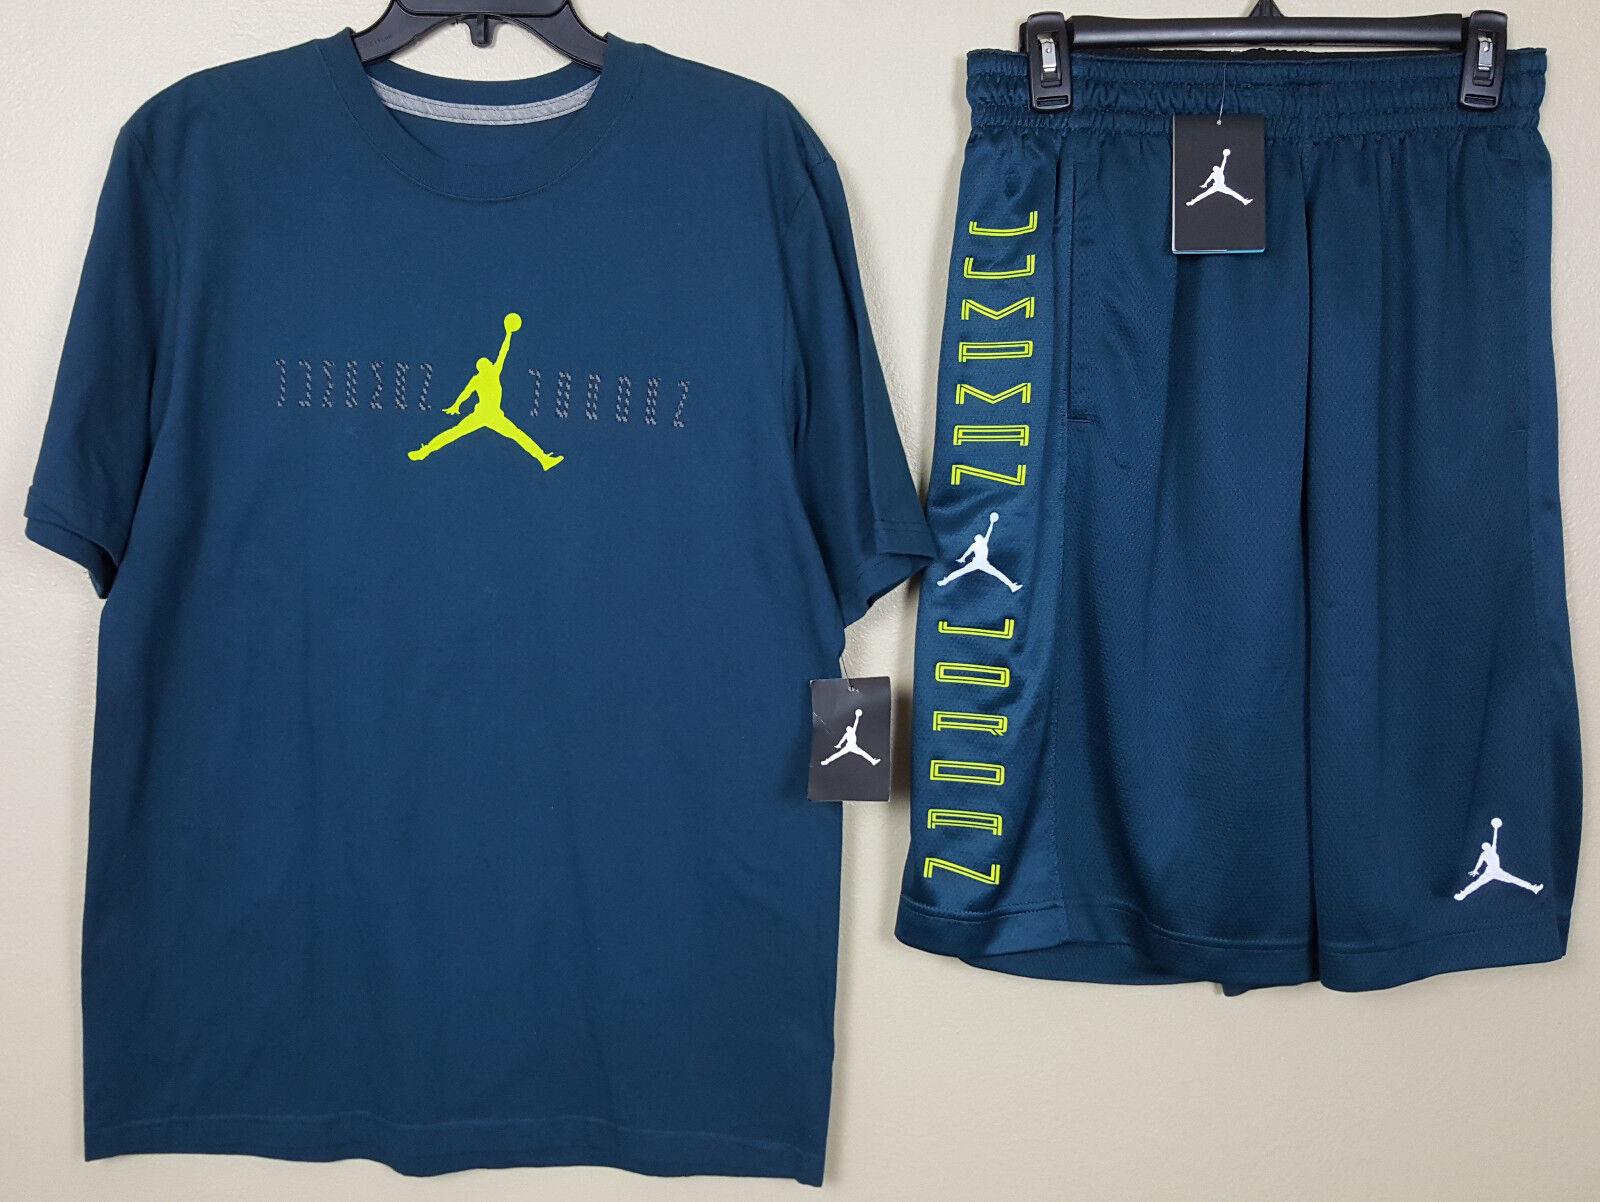 Nike jordan xi retrò 11 nightshade completo camicia   pantaloncini green new (dimensioni medie)